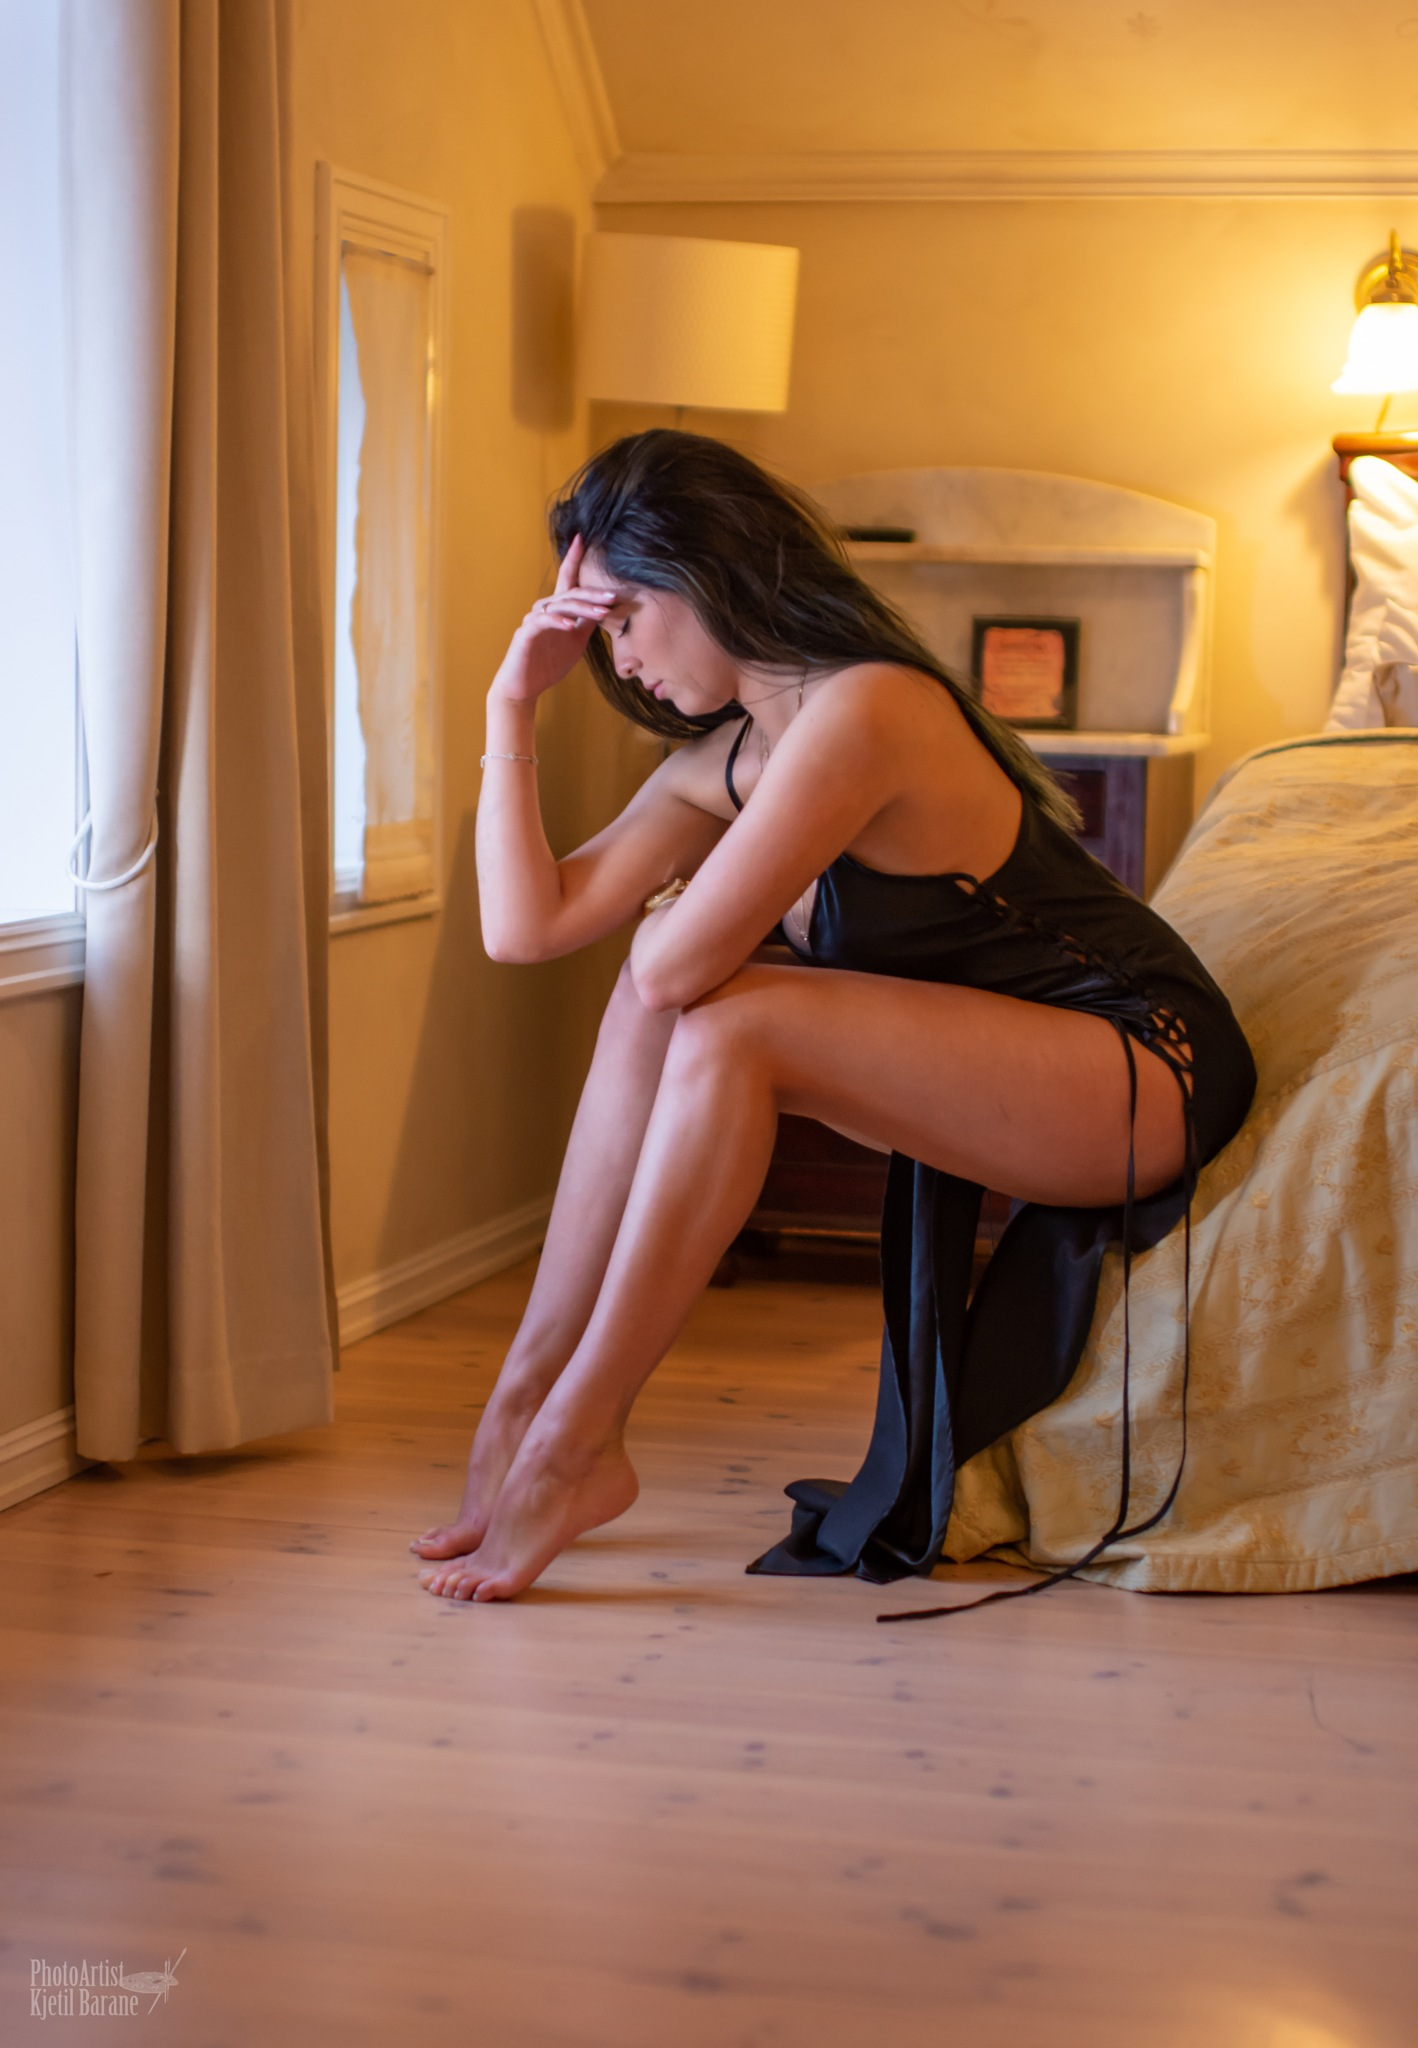 Lonely in hotelroom by Kjetil Barane